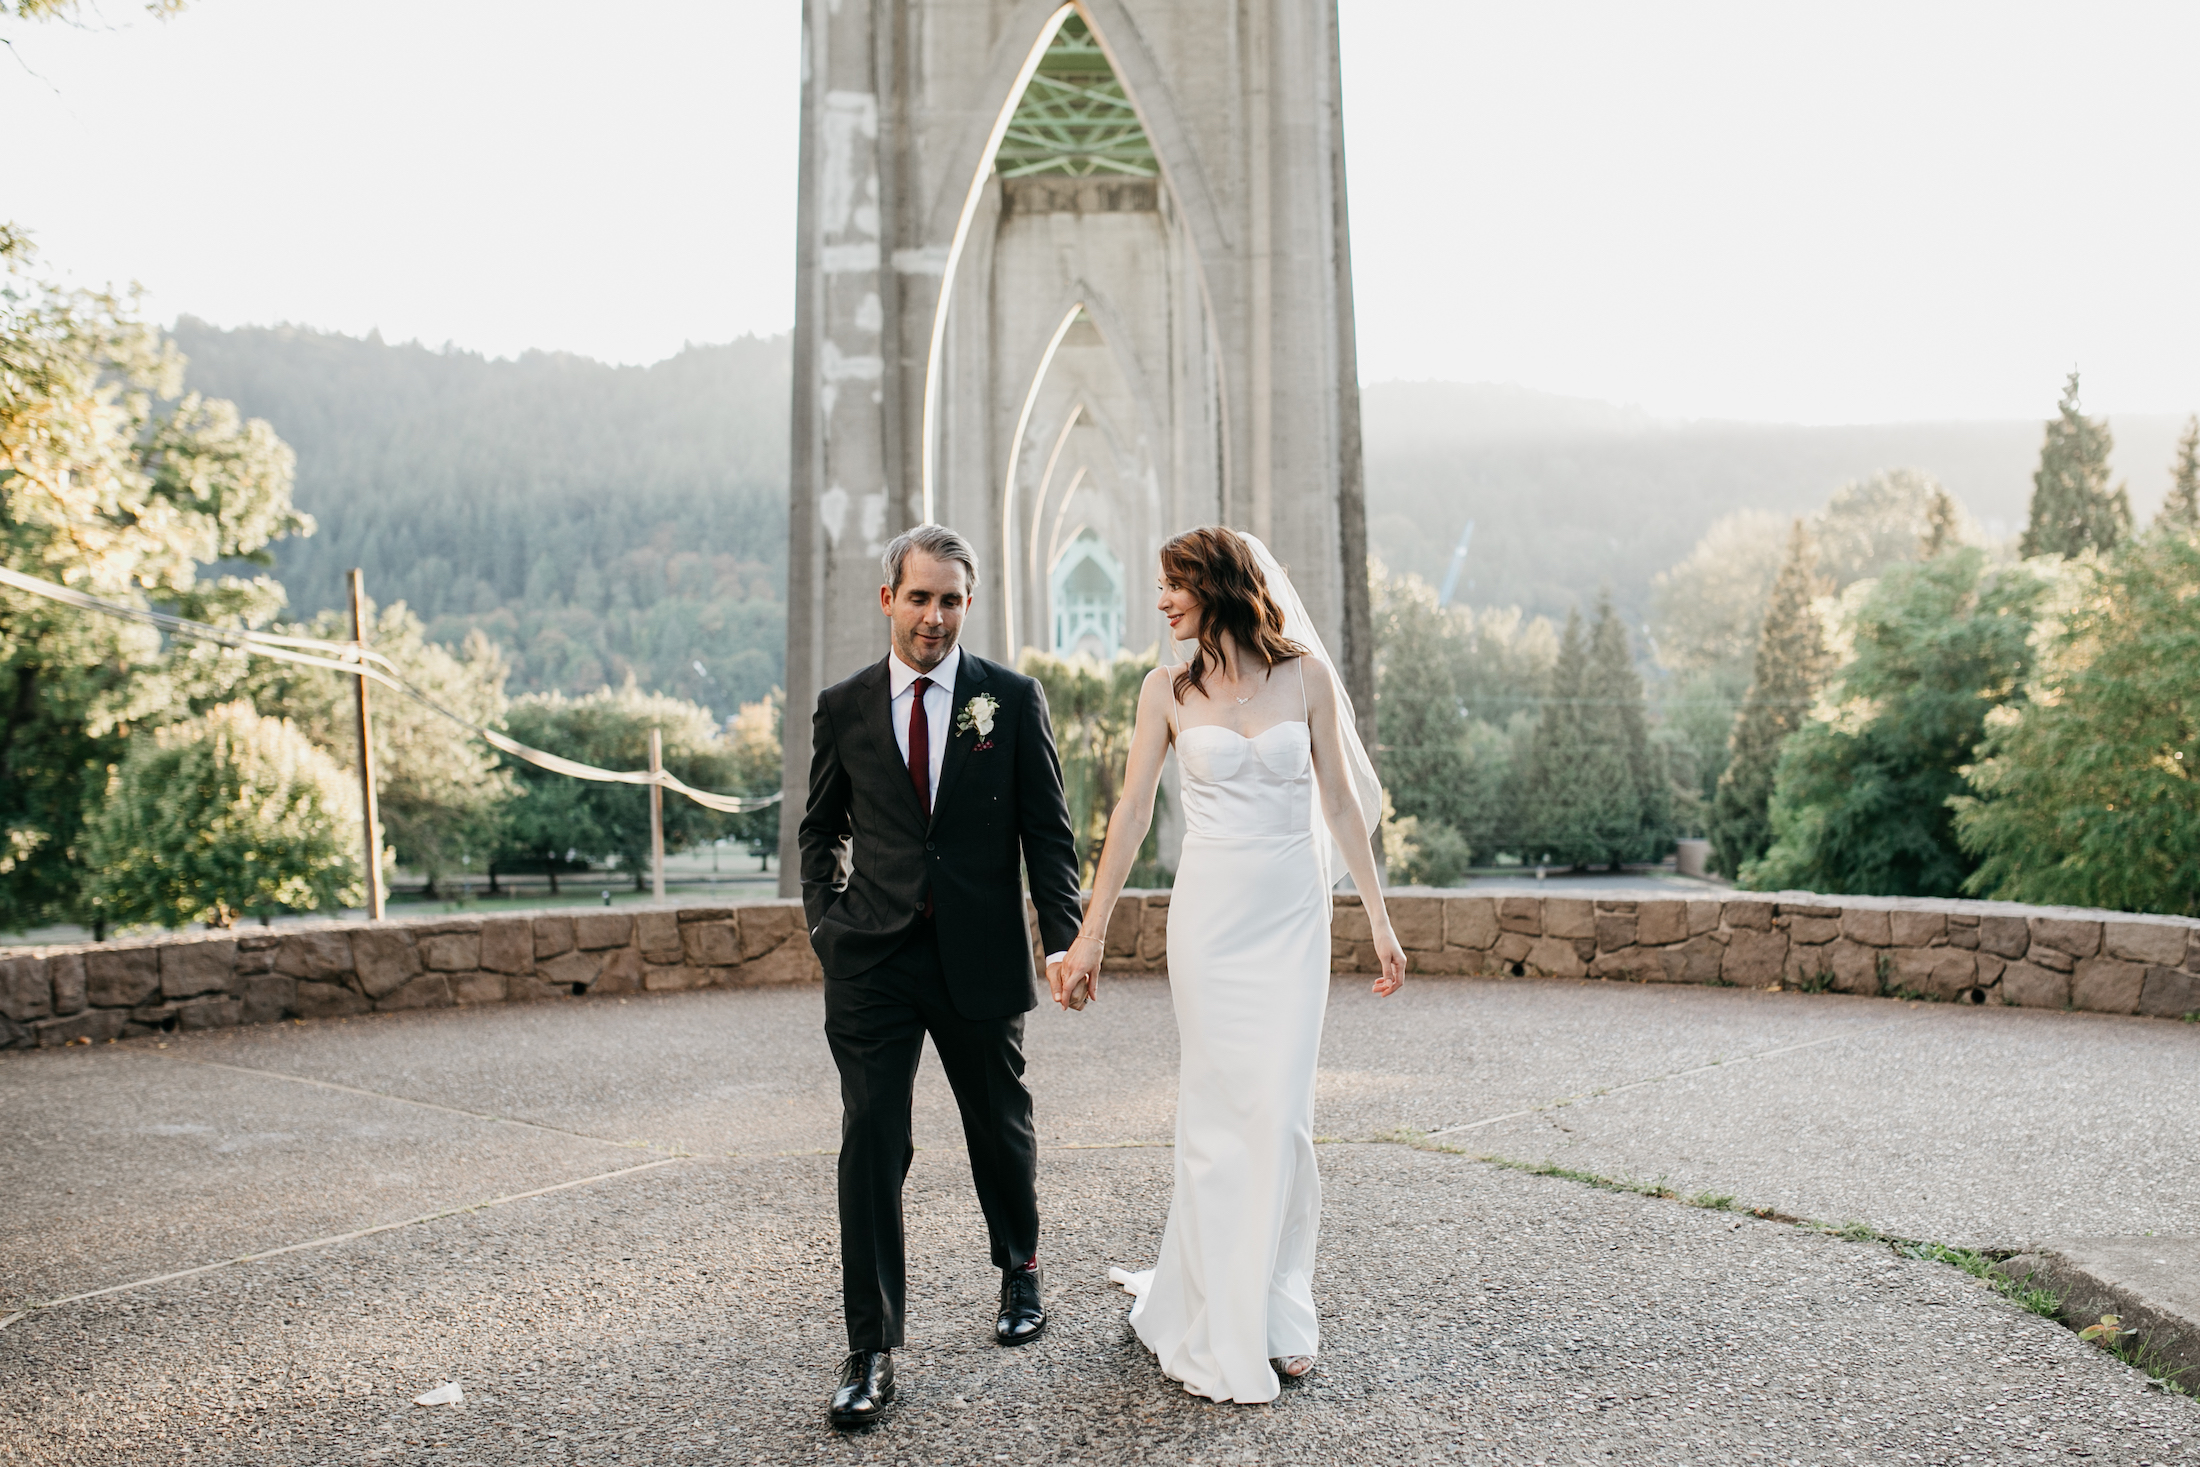 cathedral-park-portland-wedding-photographer-baker-building-wedding572.jpg